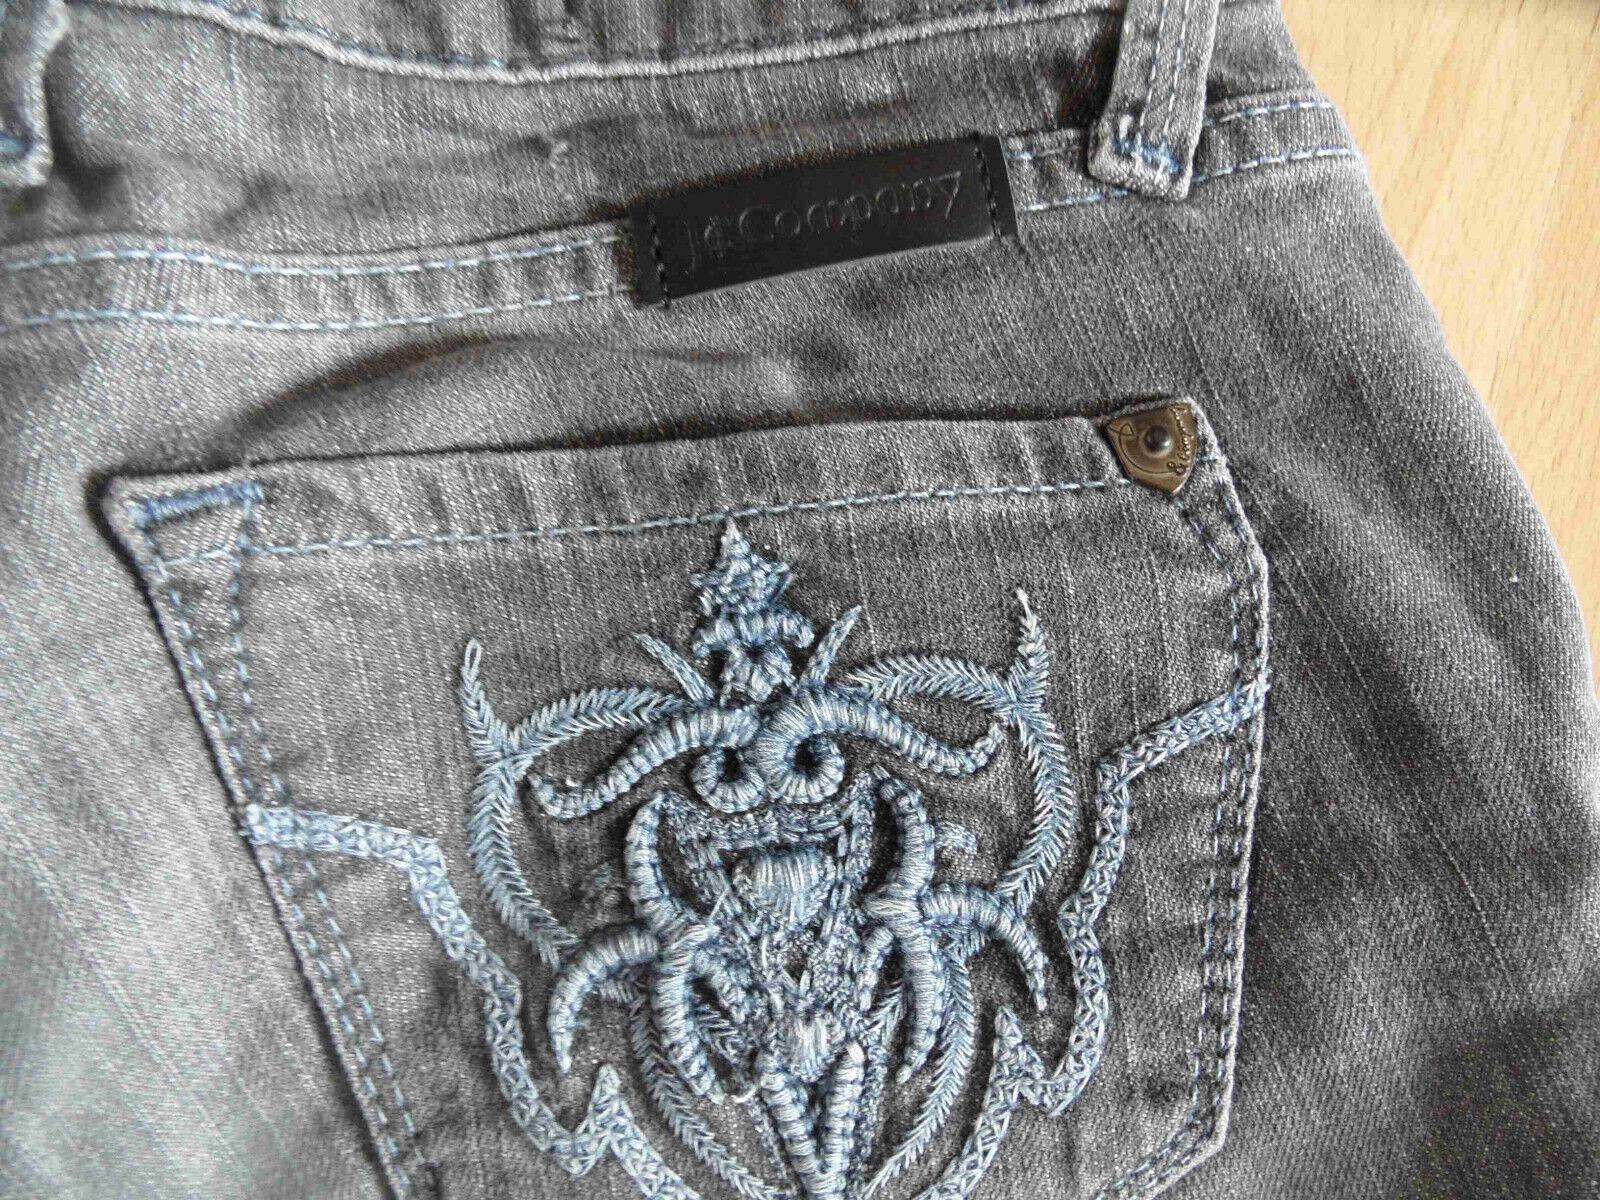 J&COMPANY coole slim fit Jeans BEVERLY grau Gr. 26 NP 229 -- NEU  08-13